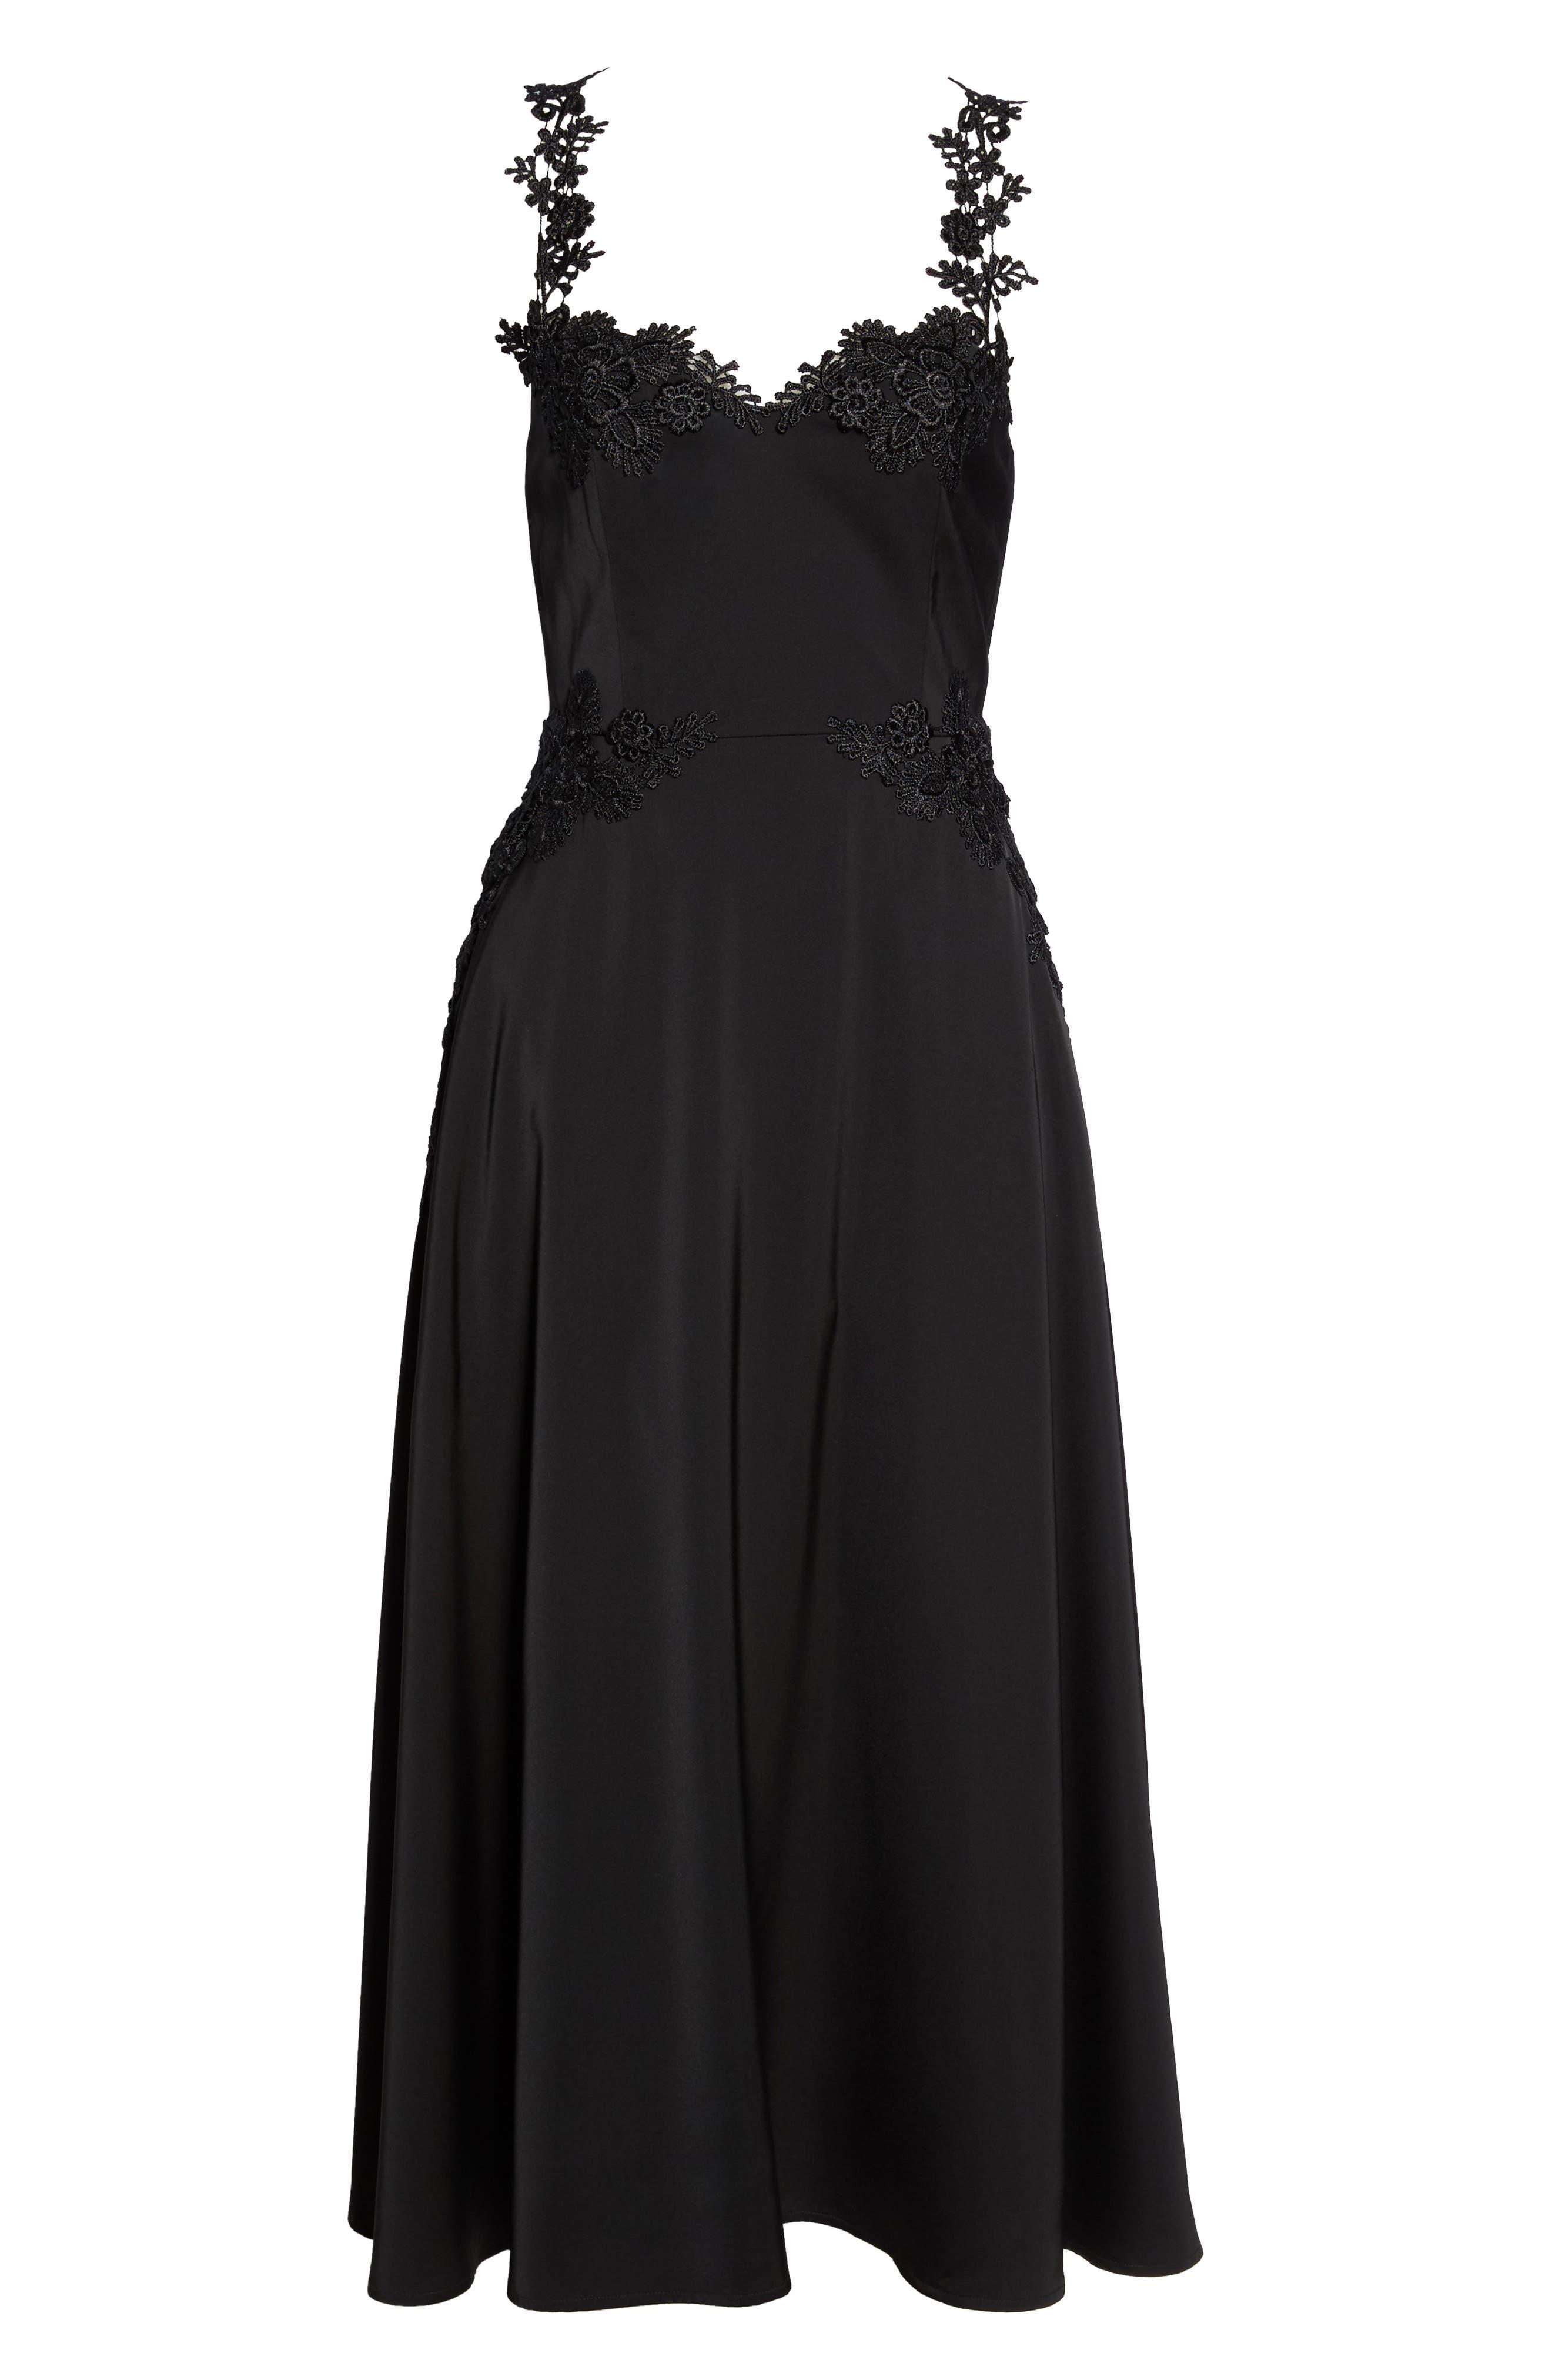 Aislinn Floral Appliqué Tea Length Dress,                             Alternate thumbnail 6, color,                             001